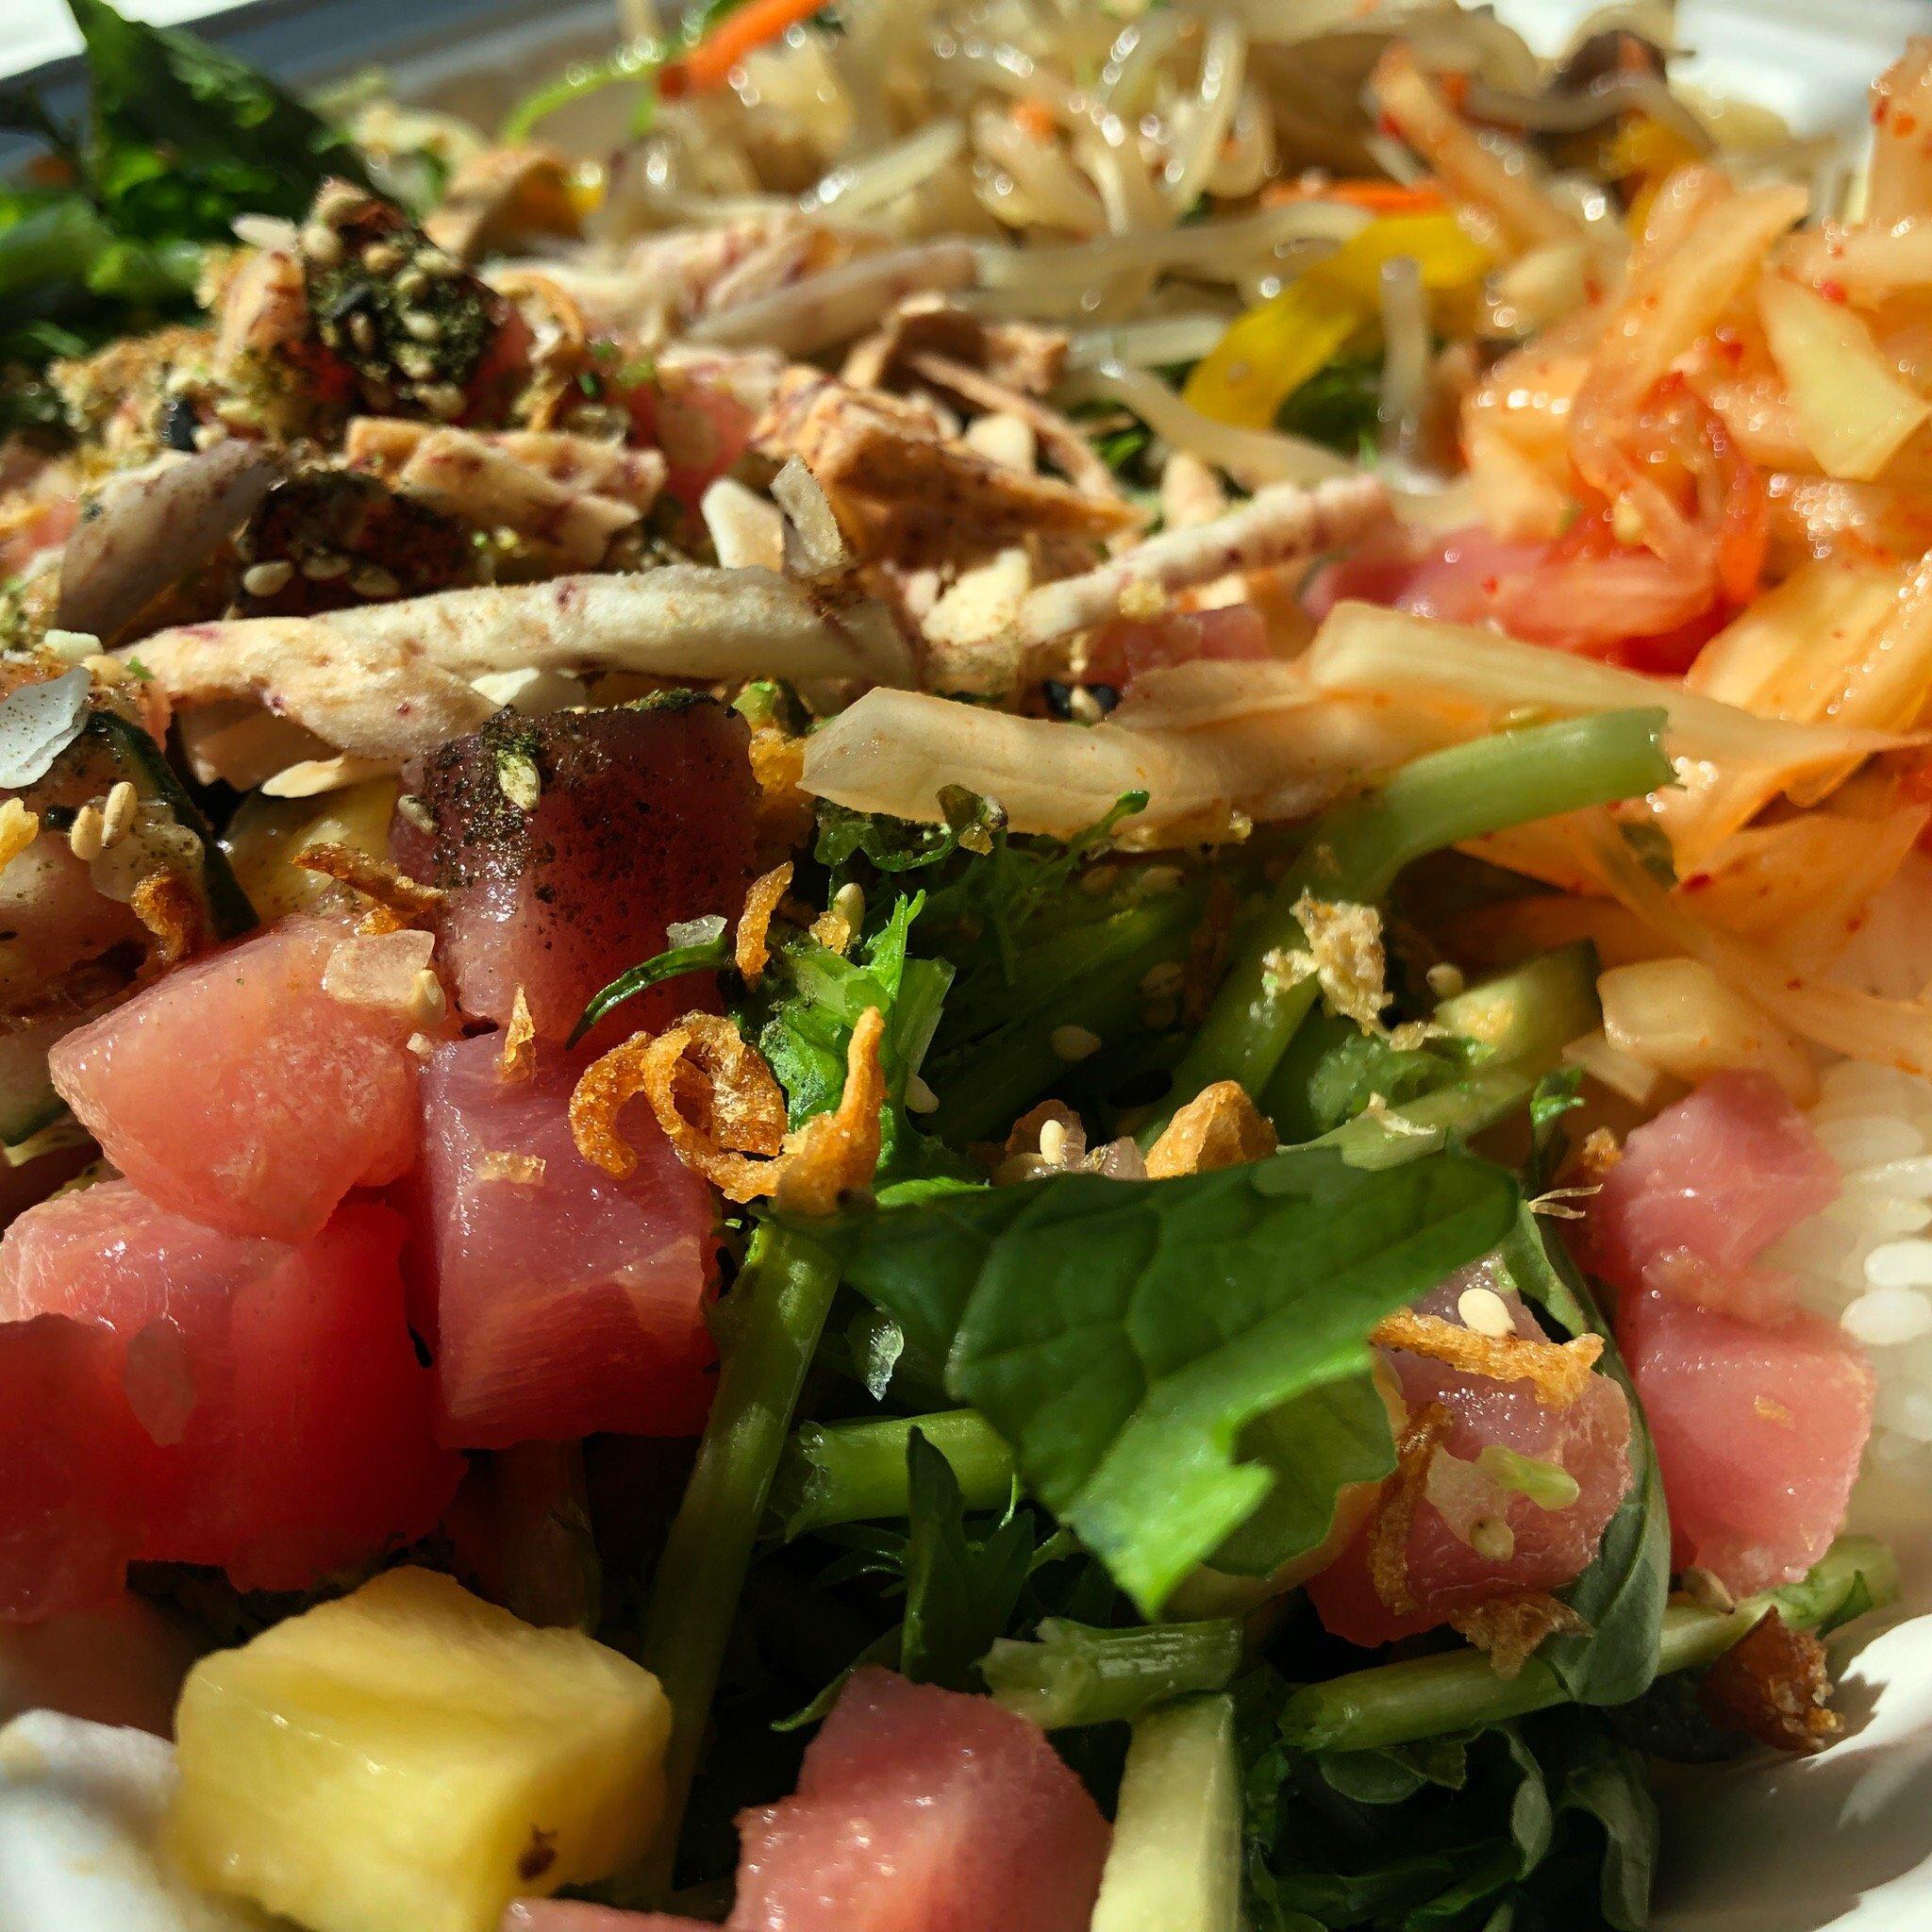 Turtle Boat - Colorado Poki Salads 2231 S Broadway, Denver